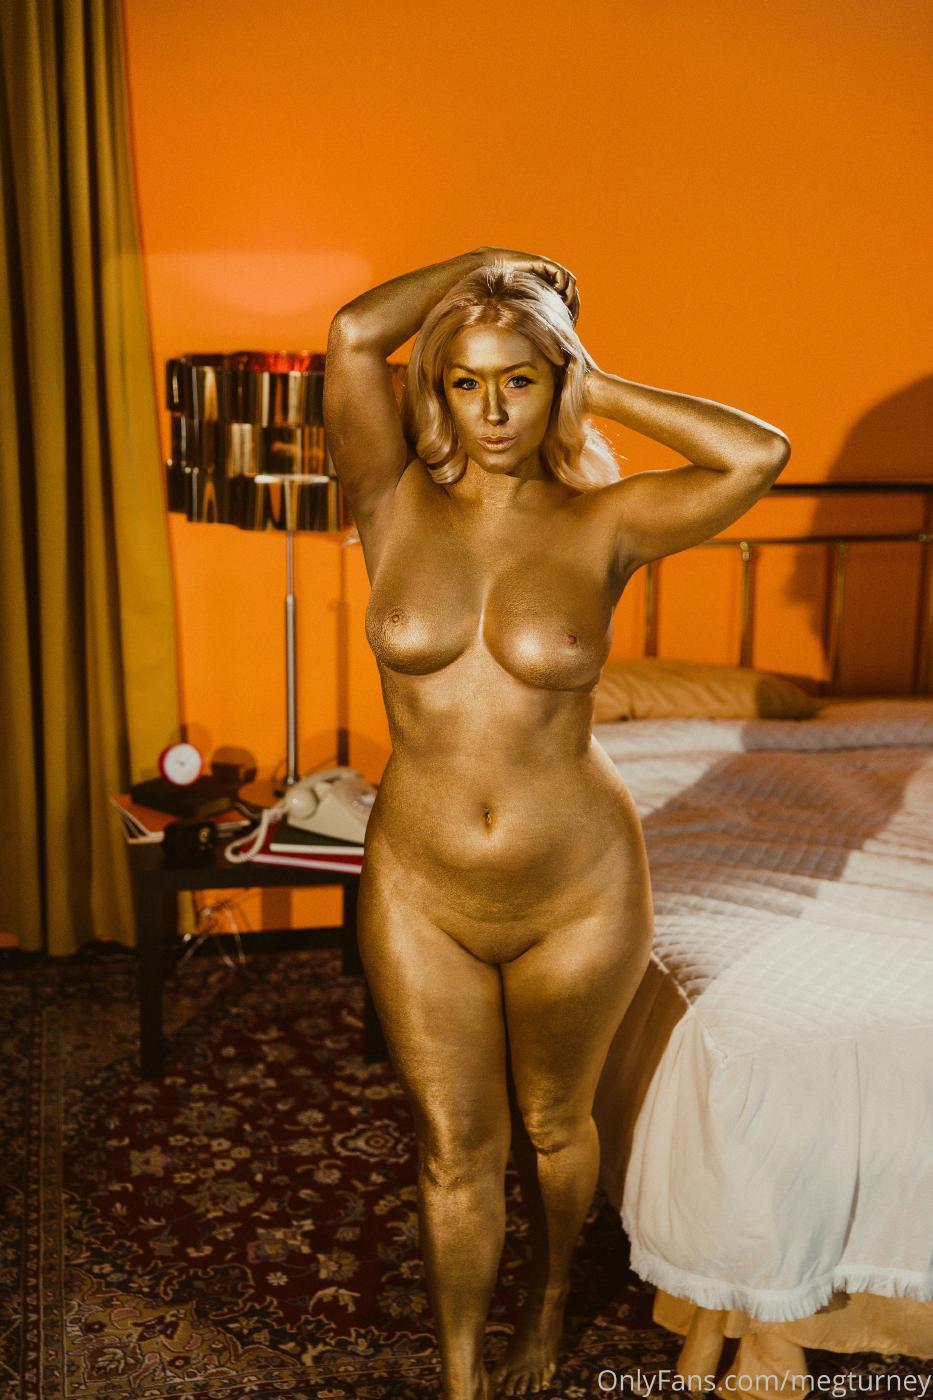 Meg Turney Nude Goldfinger Costume Onlyfans Video Leaked